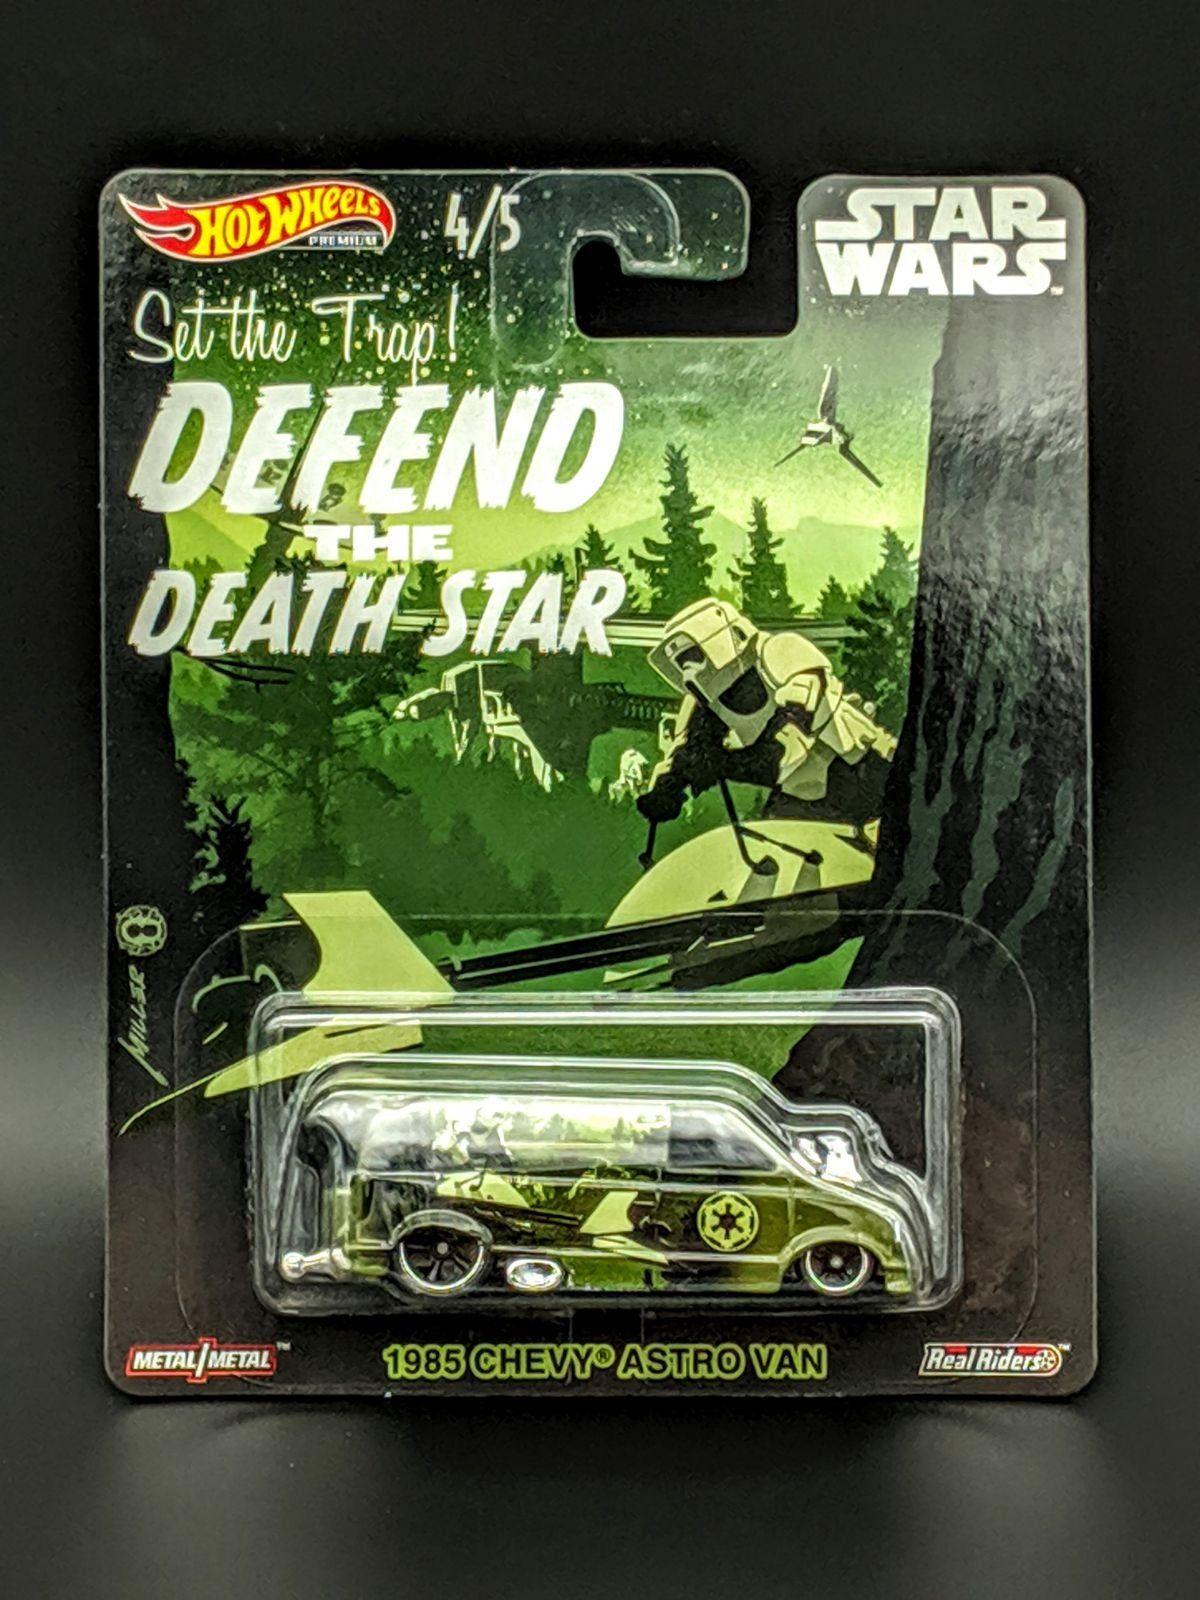 Hot Wheels Star Wars 1985 Chevy Astro Van Hot wheels